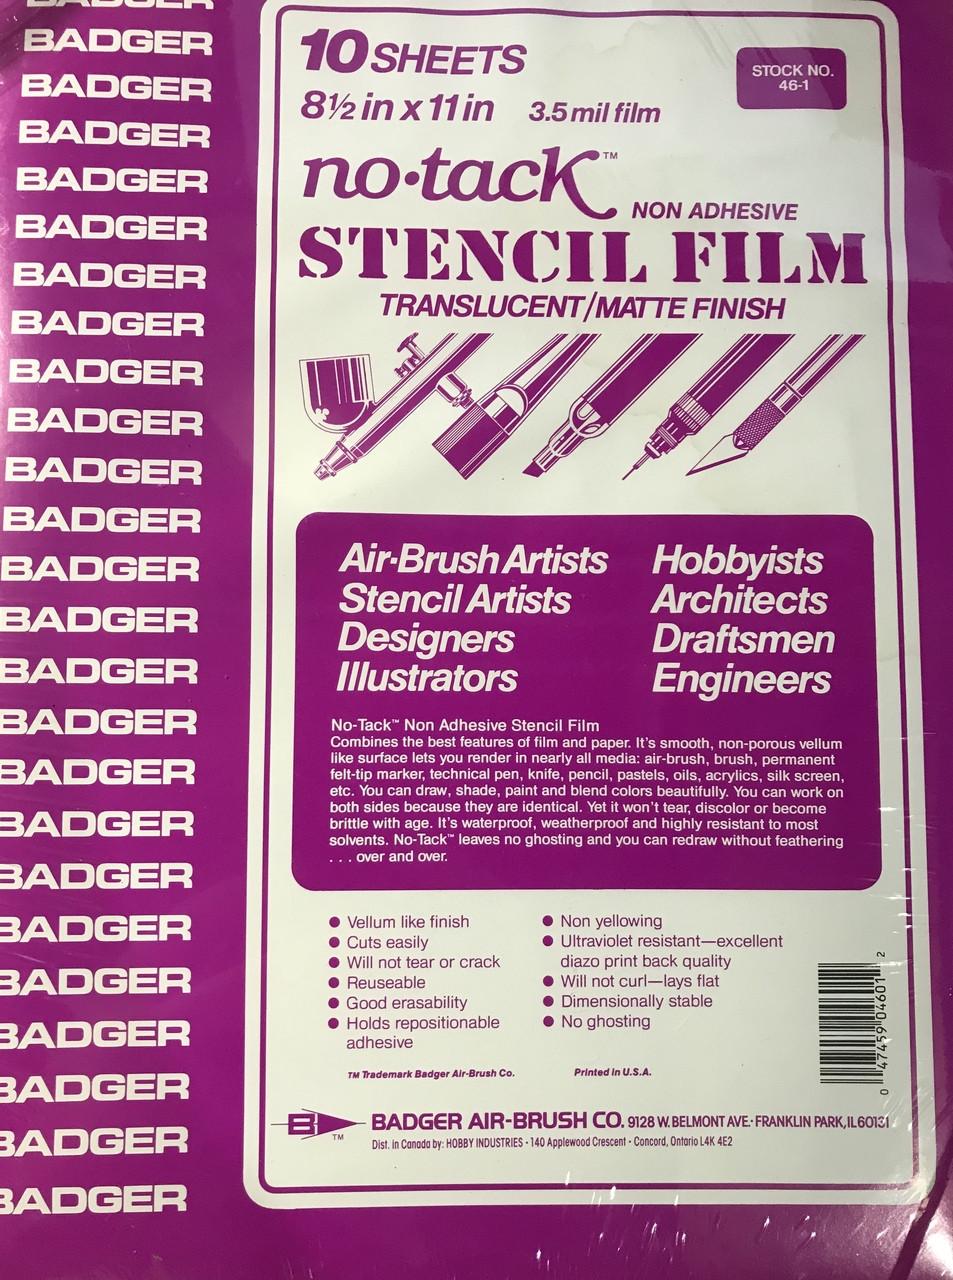 Badger NO-TACKª (NON-ADHESIVE) STENCIL FILM